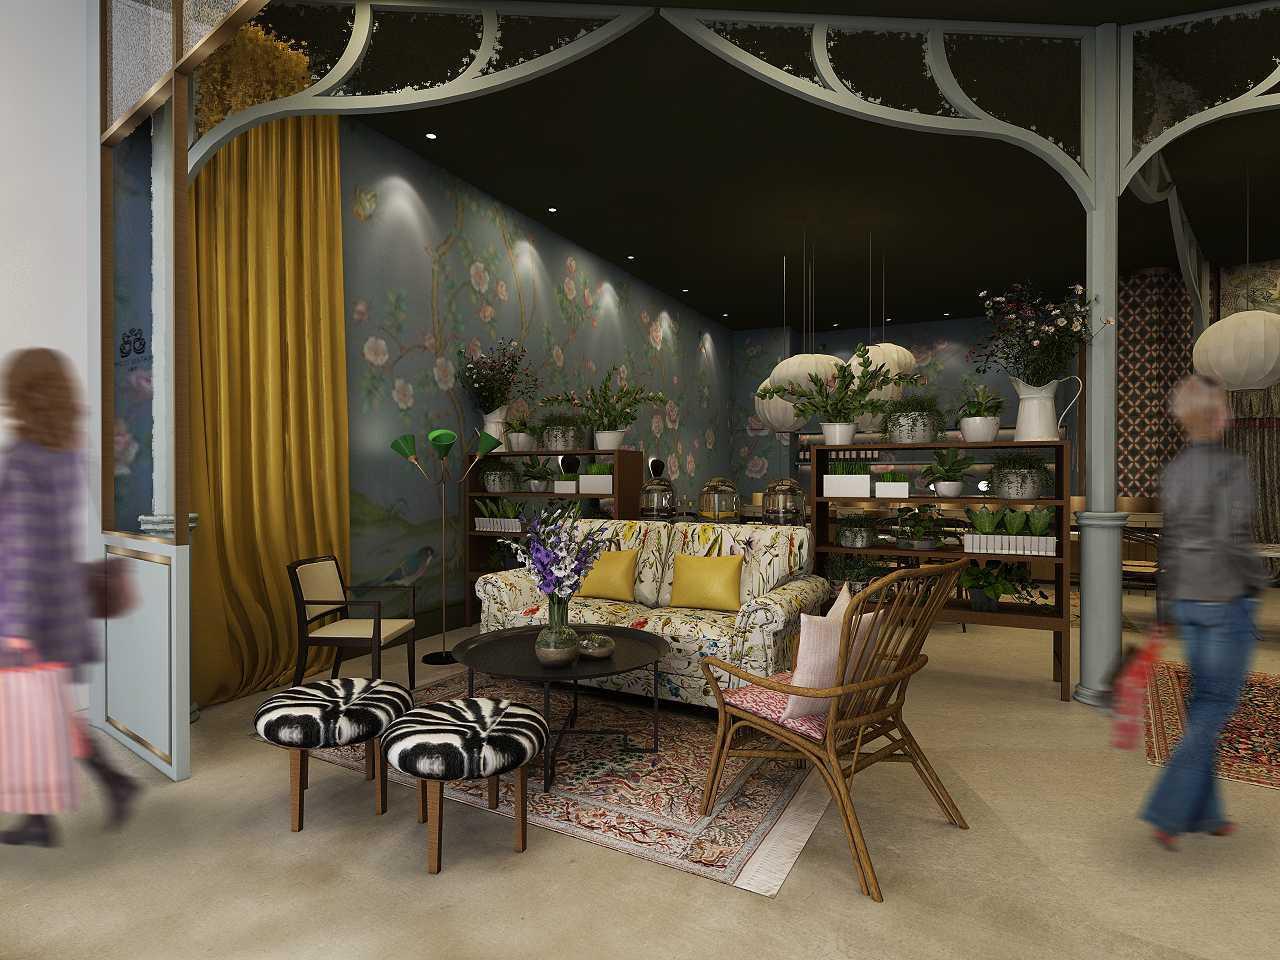 Studio Ig Interior Soematra Flower Cafe Kota Sby, Jawa Timur, Indonesia Kota Sby, Jawa Timur, Indonesia Seating Area Restaurant   49630